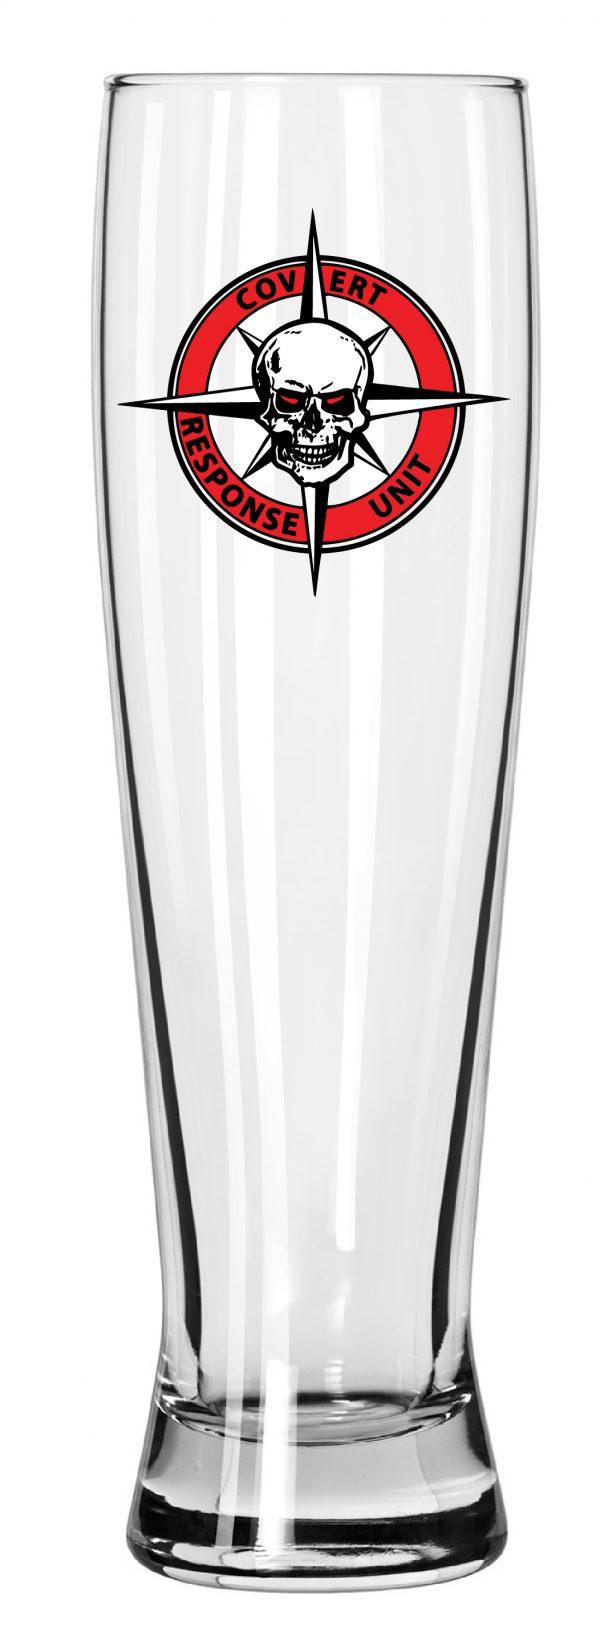 1691- 20 oz. Altitude Beer Pilsner-0